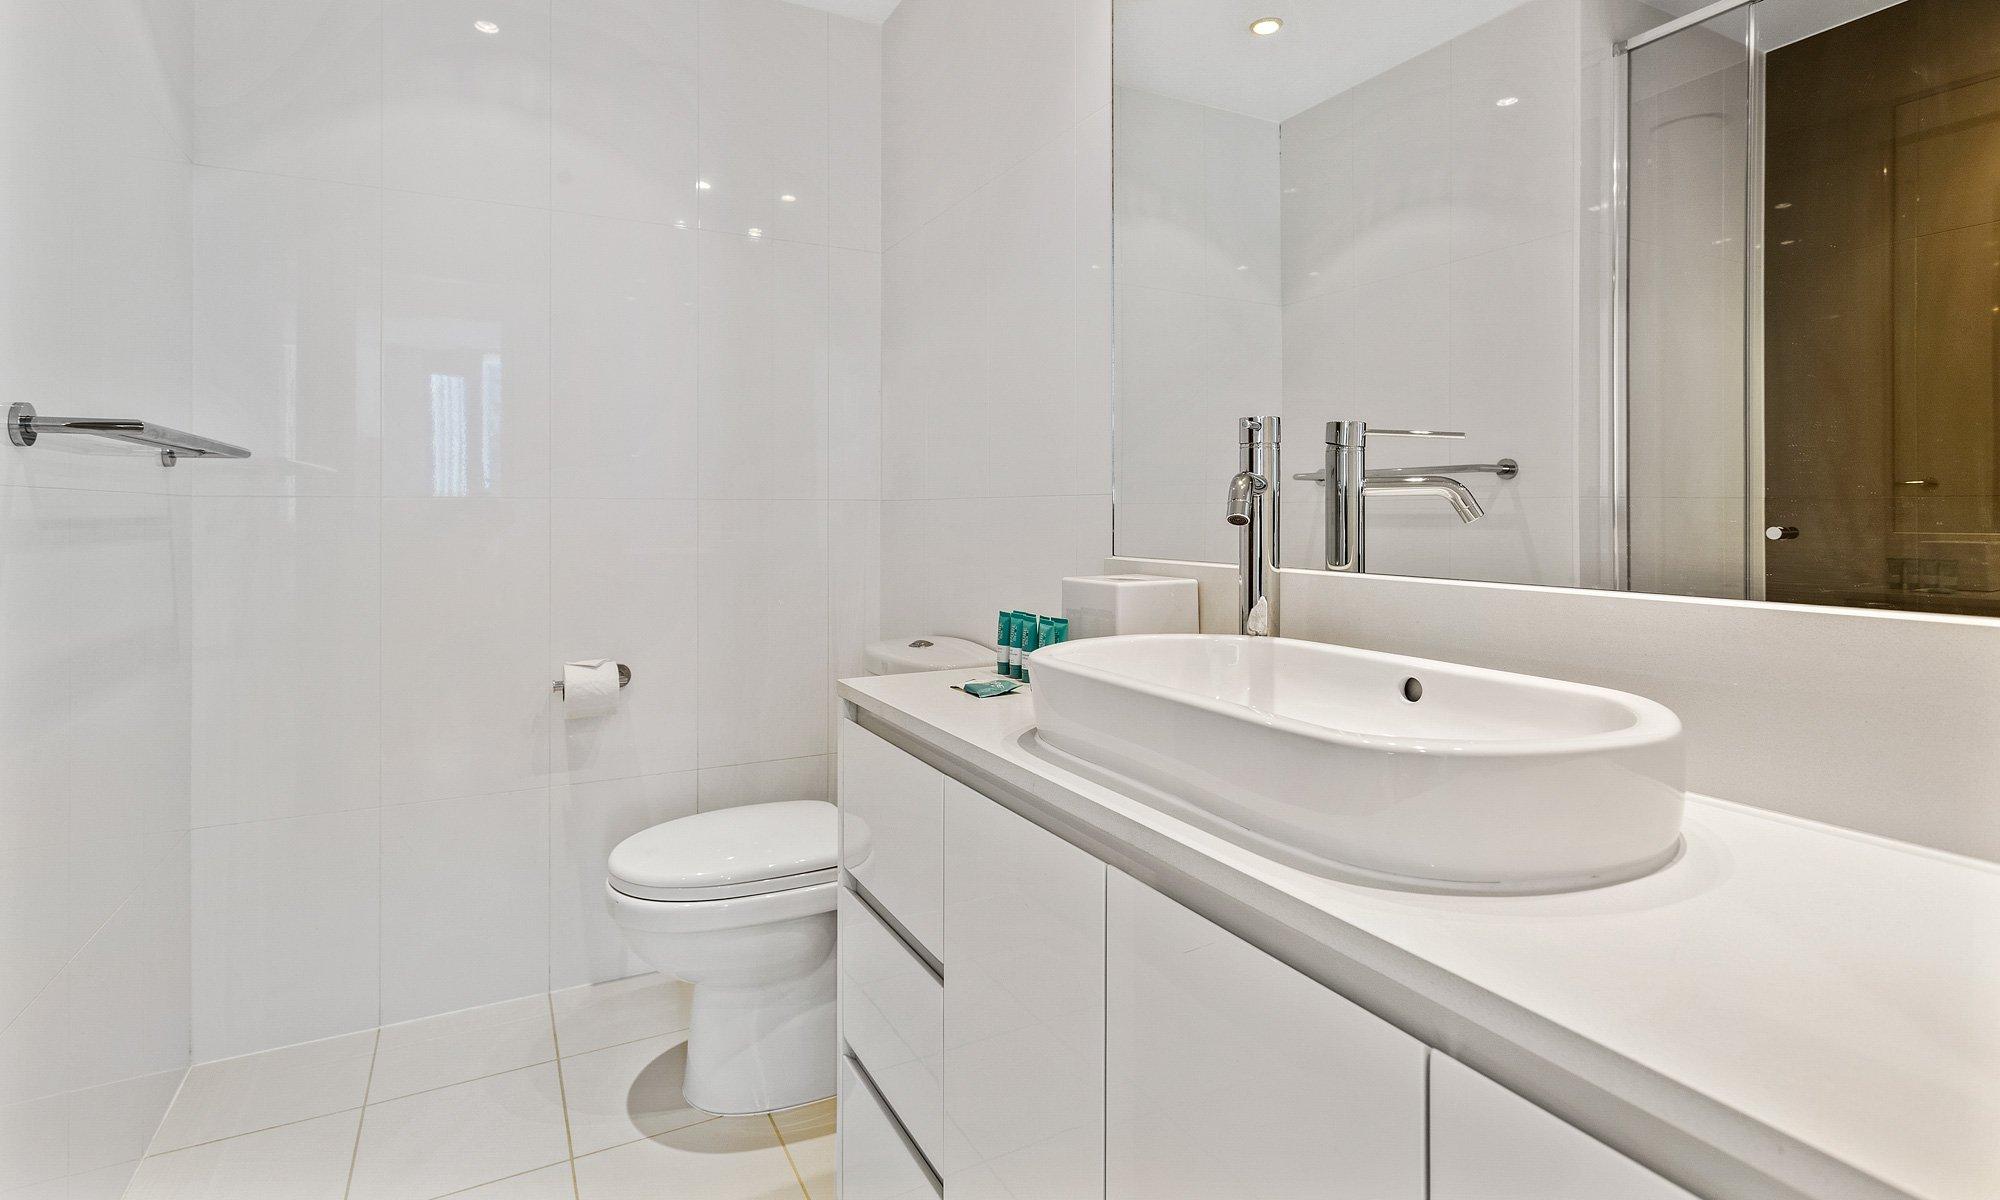 Gold Coast real estate for rent H Residences 21903 above Hilton Surfers Paradise ensuite